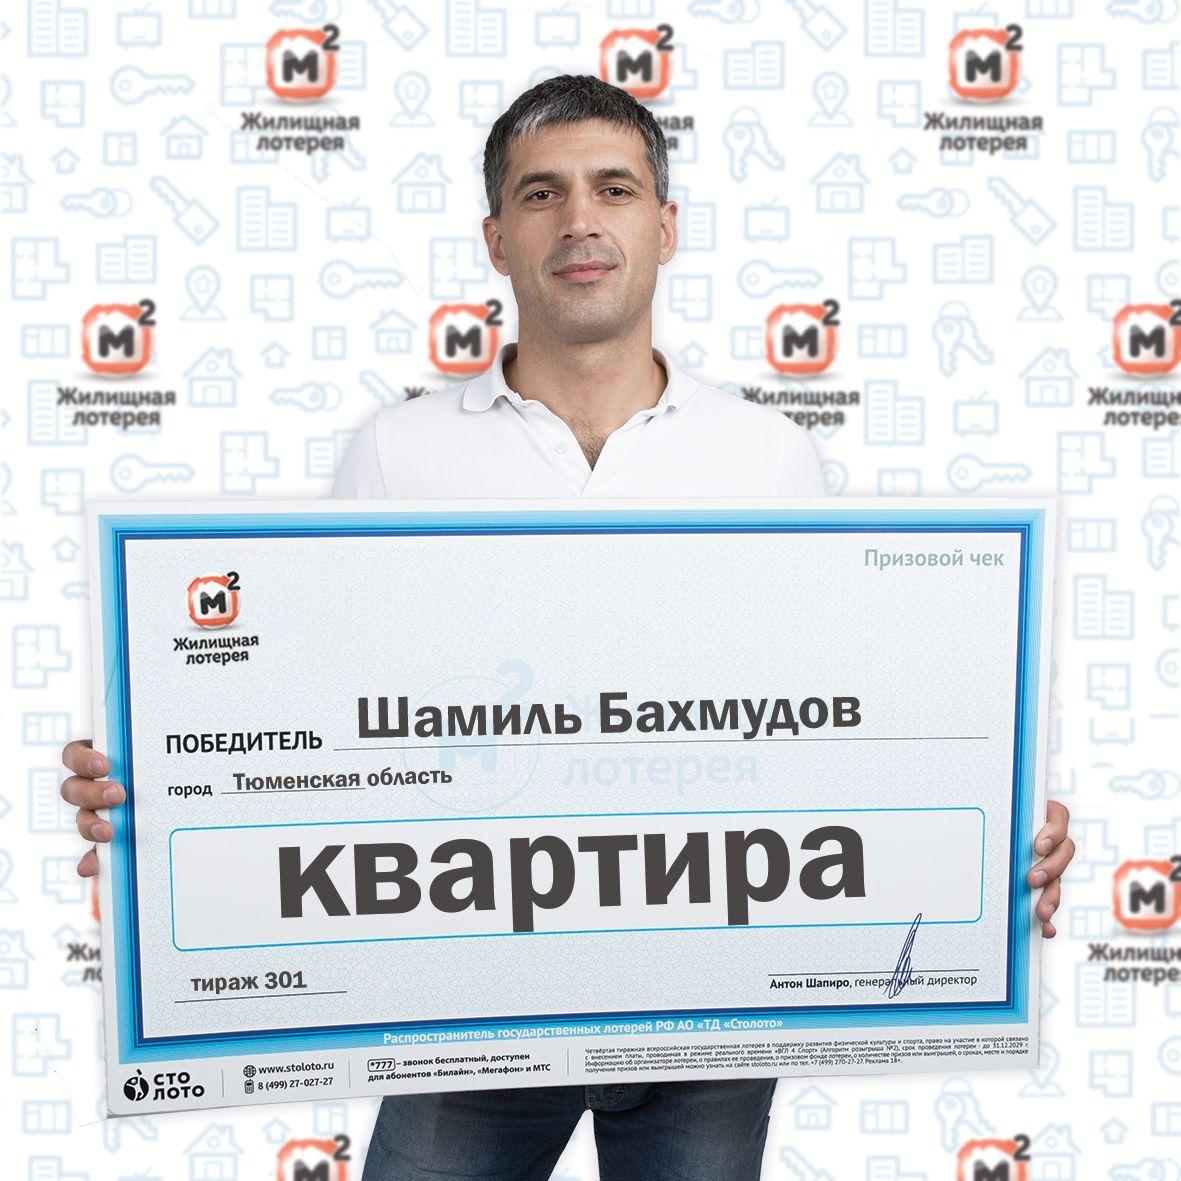 www.stoloto.ru и www.lotonews.ru проверить билет